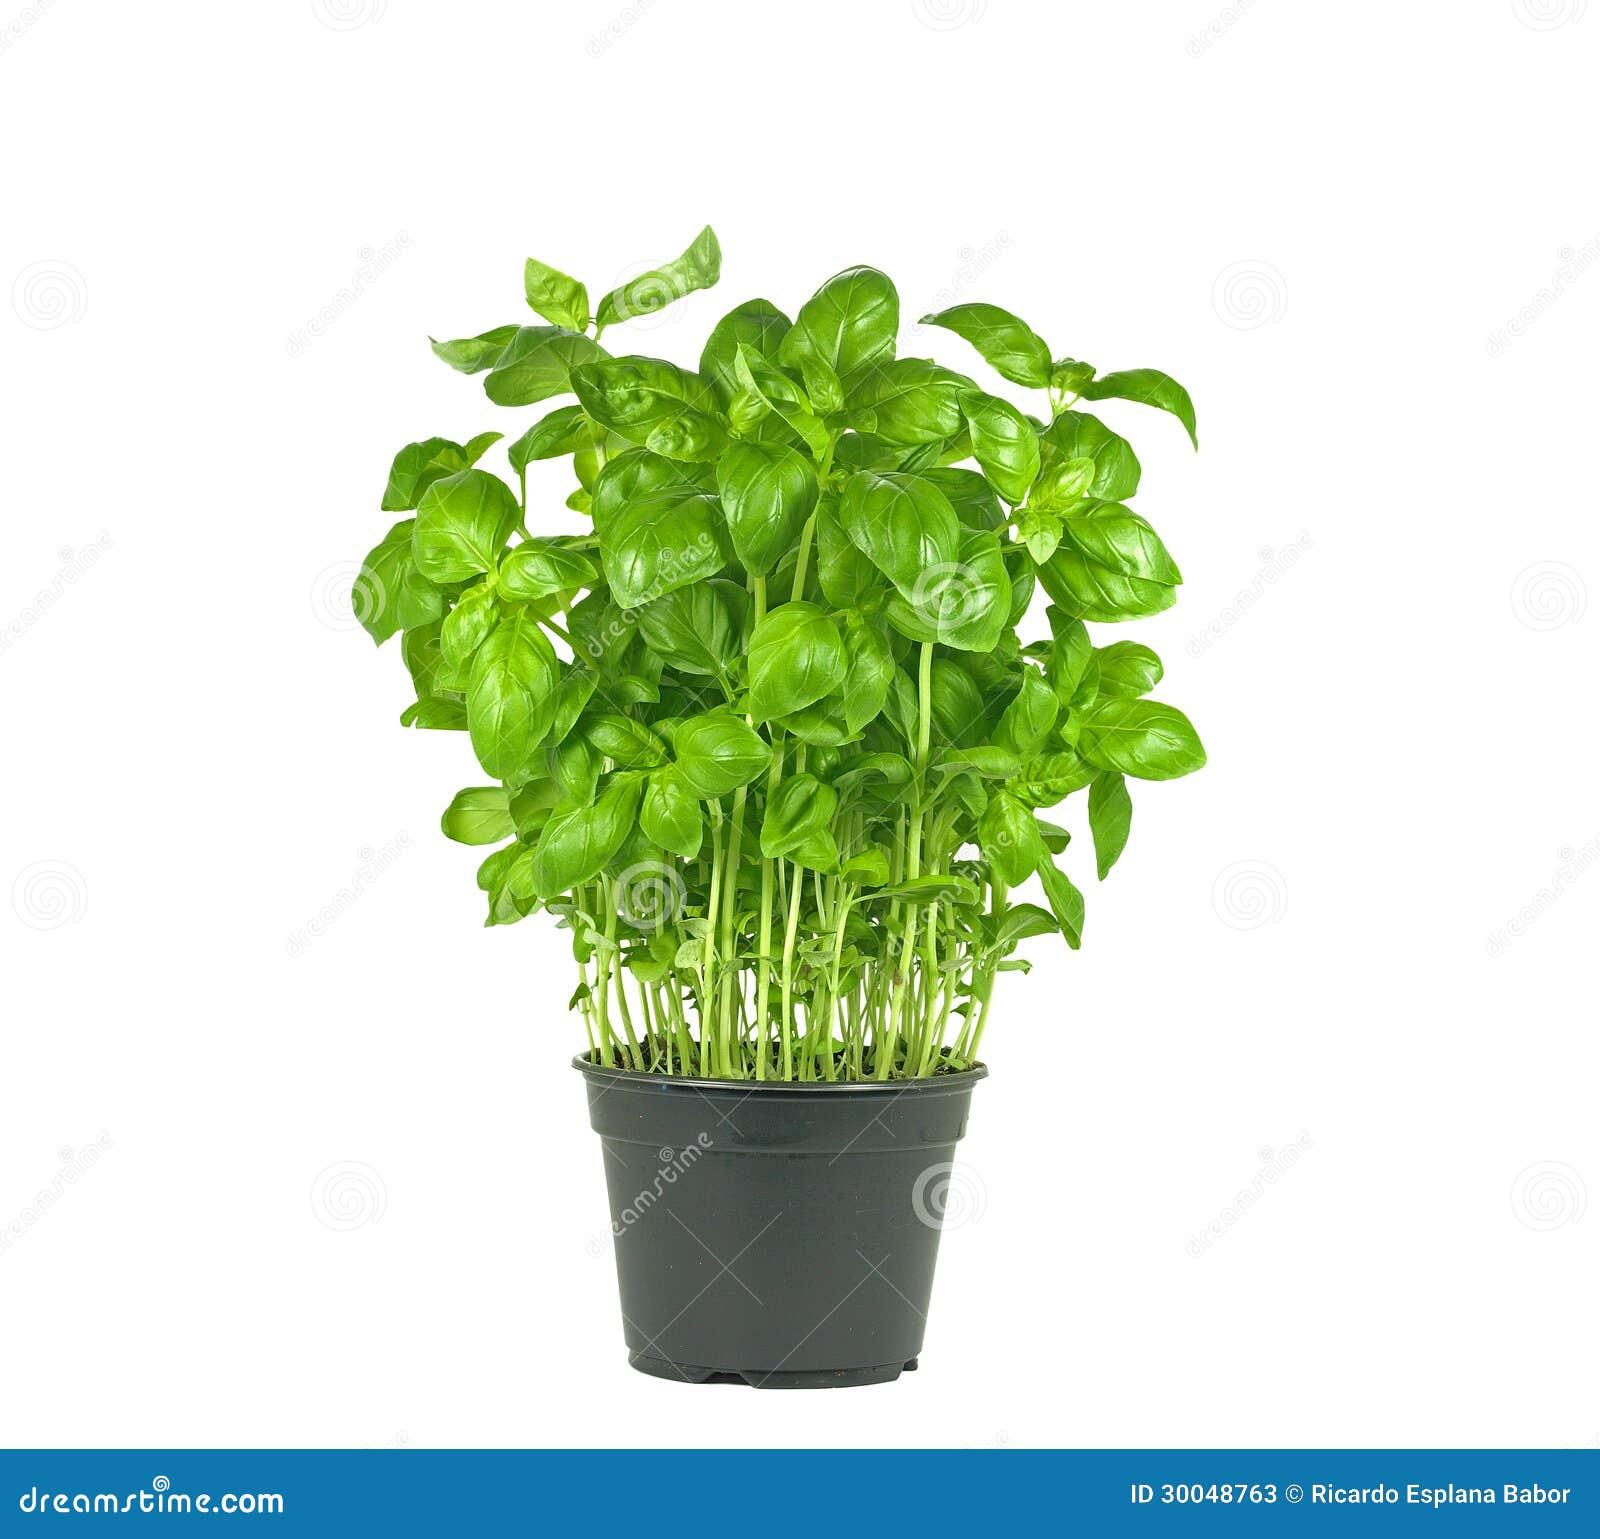 fresh basil plant stock image image of fresh closeup 30048763. Black Bedroom Furniture Sets. Home Design Ideas